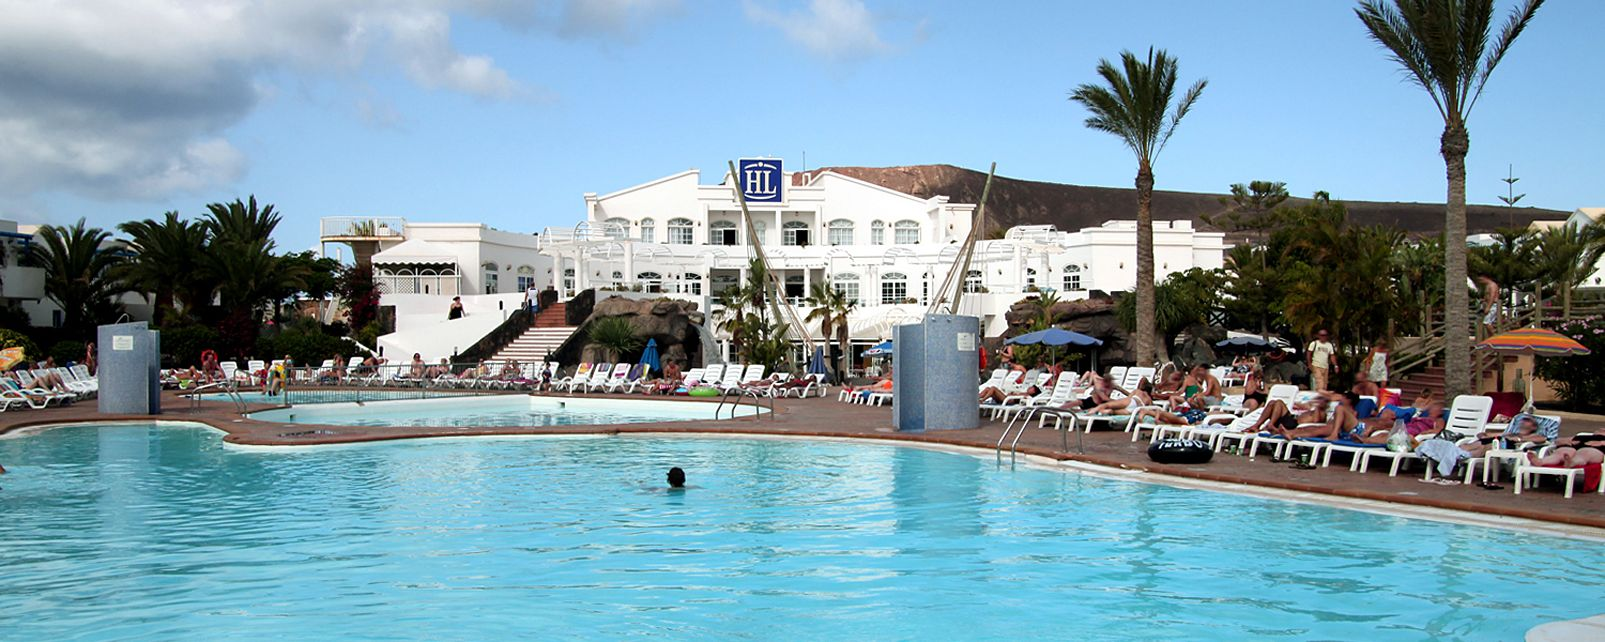 Hôtel HL Paradise Island